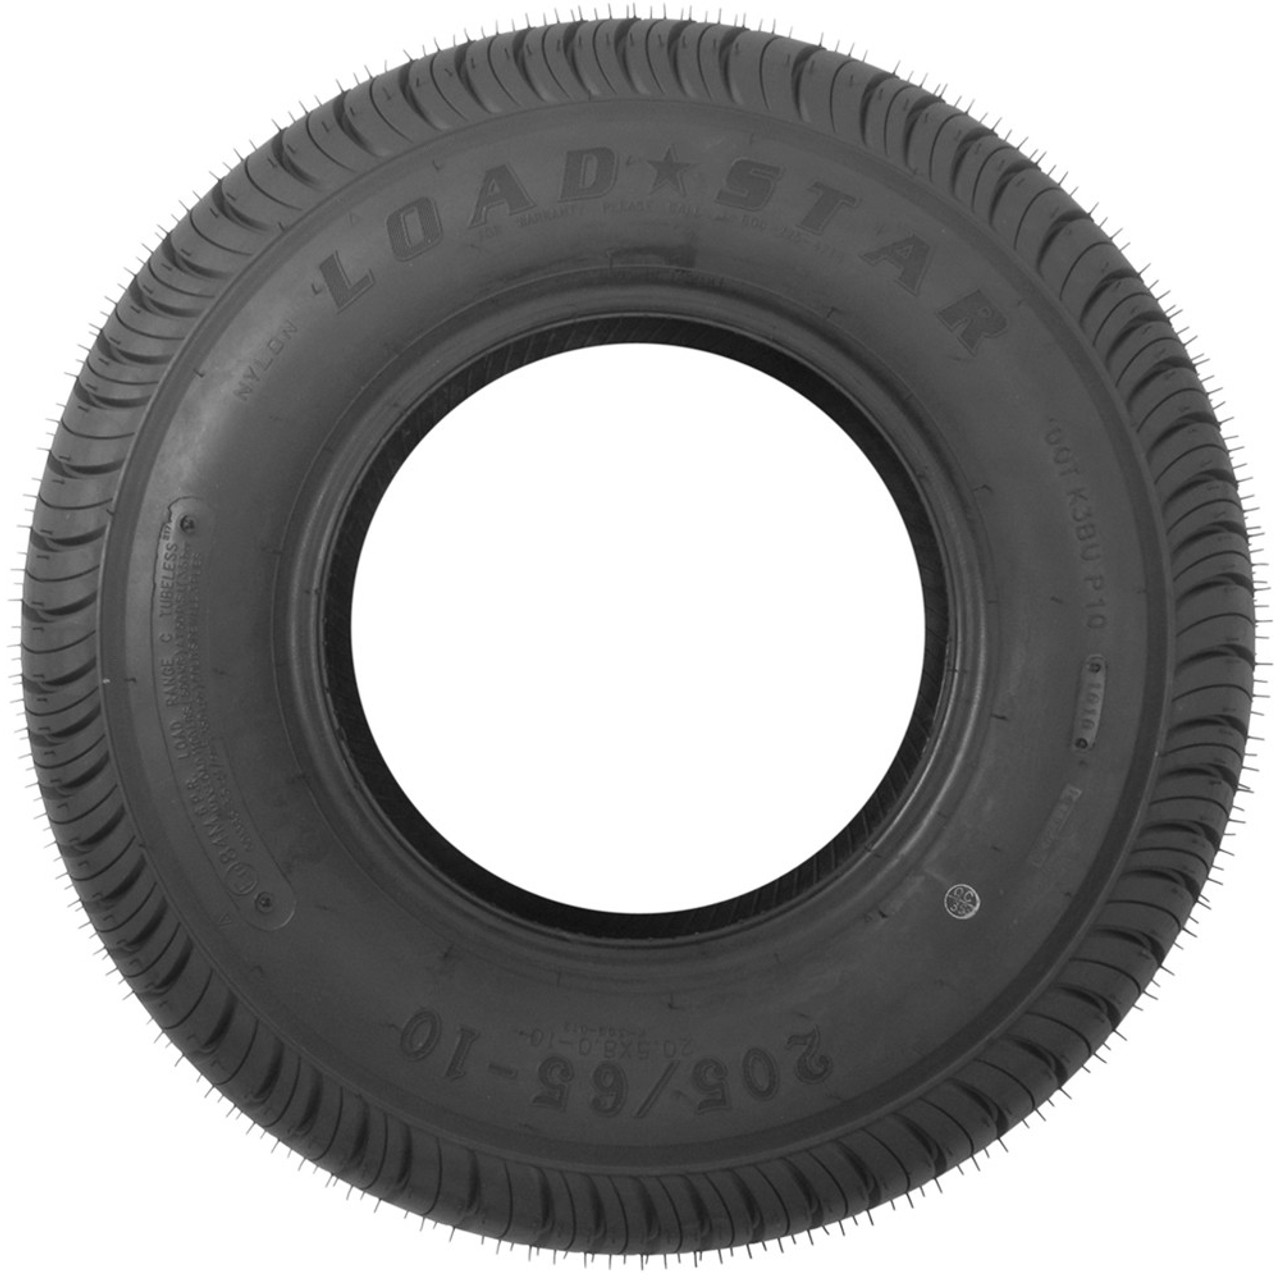 ATW10004 & ATW10013 Dolly Tire